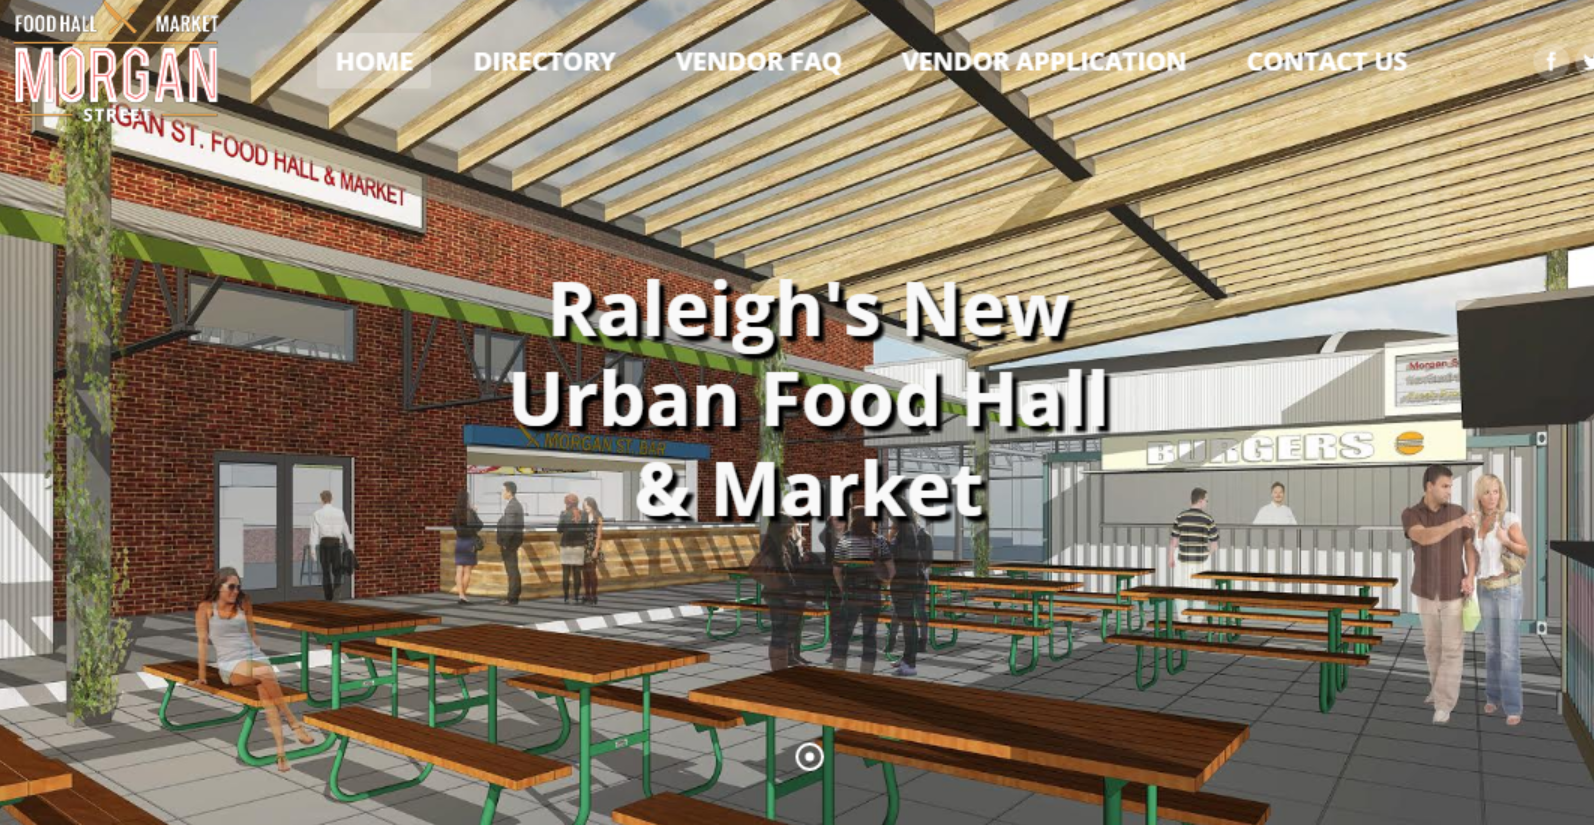 Morgan Street Food Hall and Market